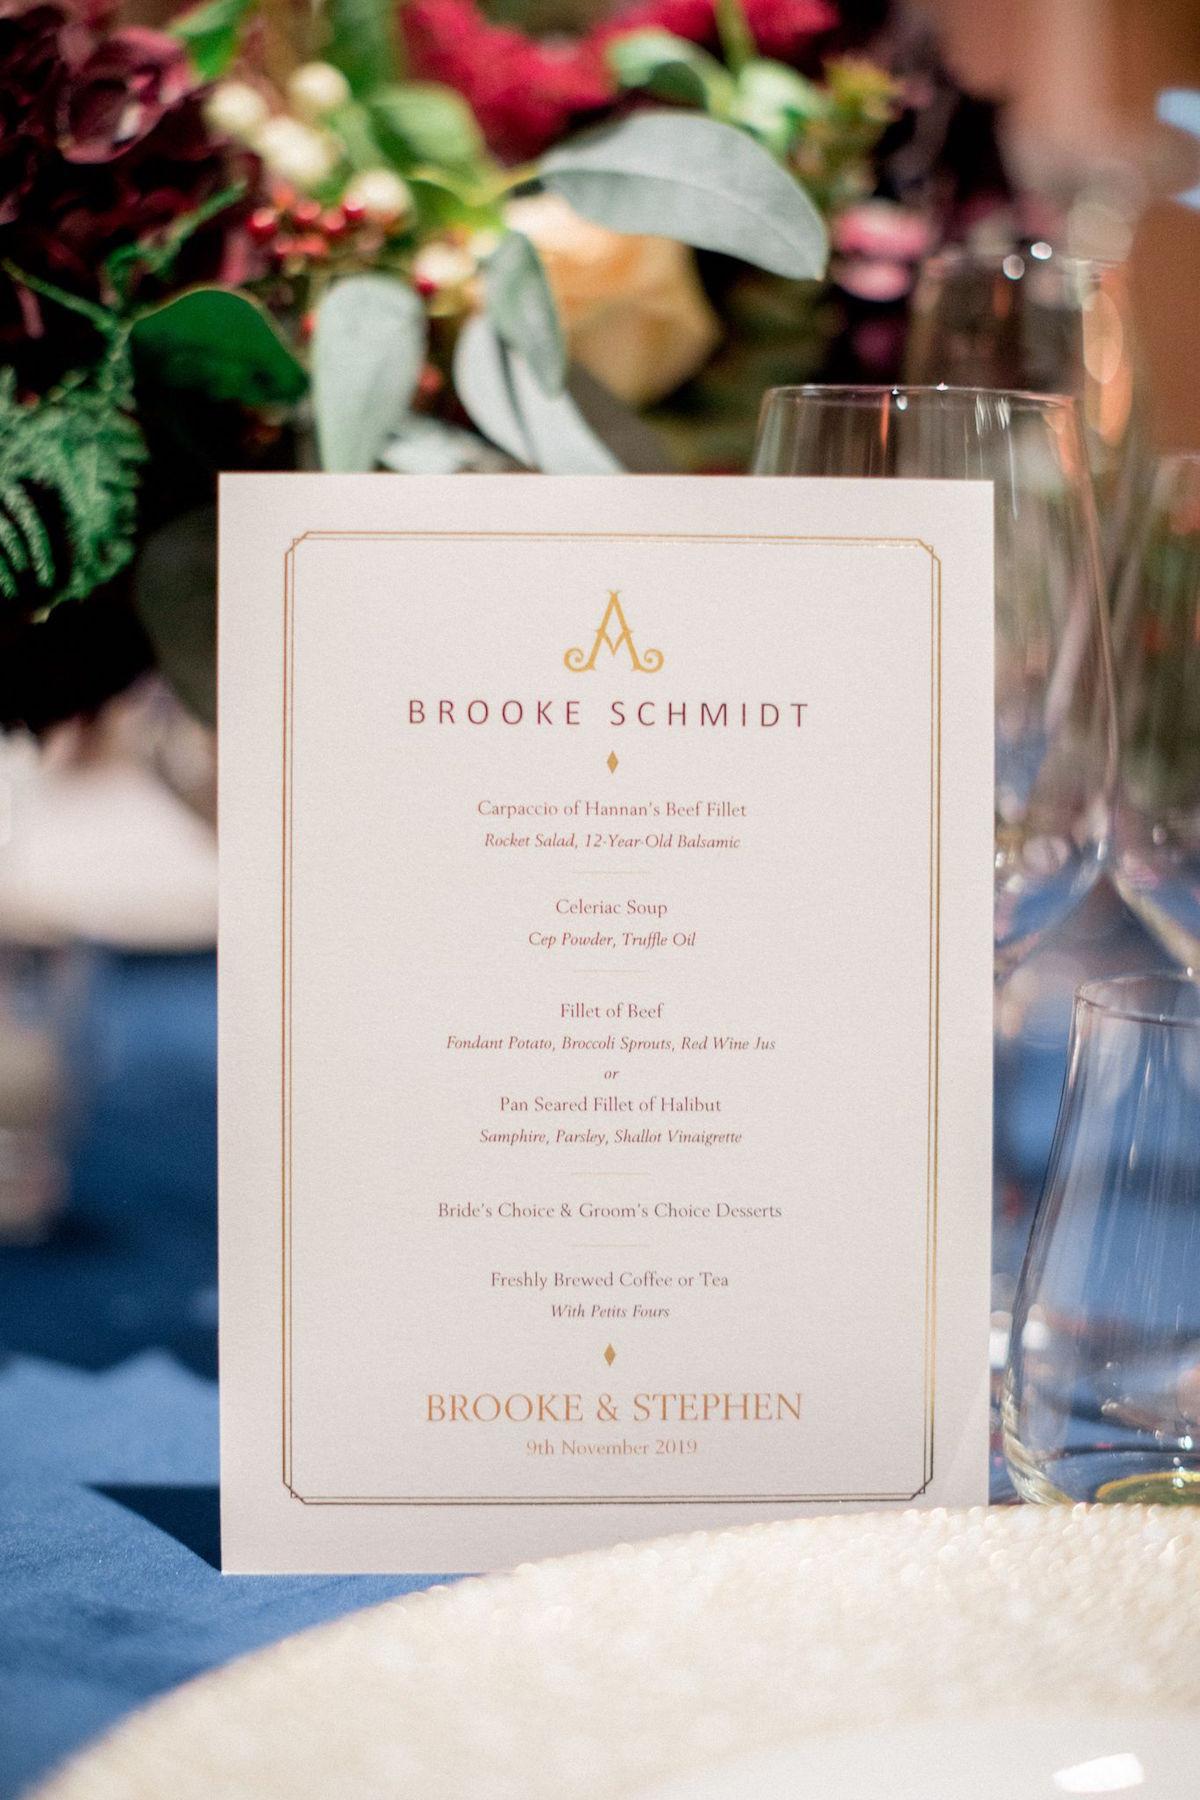 Personalized menu for Adare Manor wedding